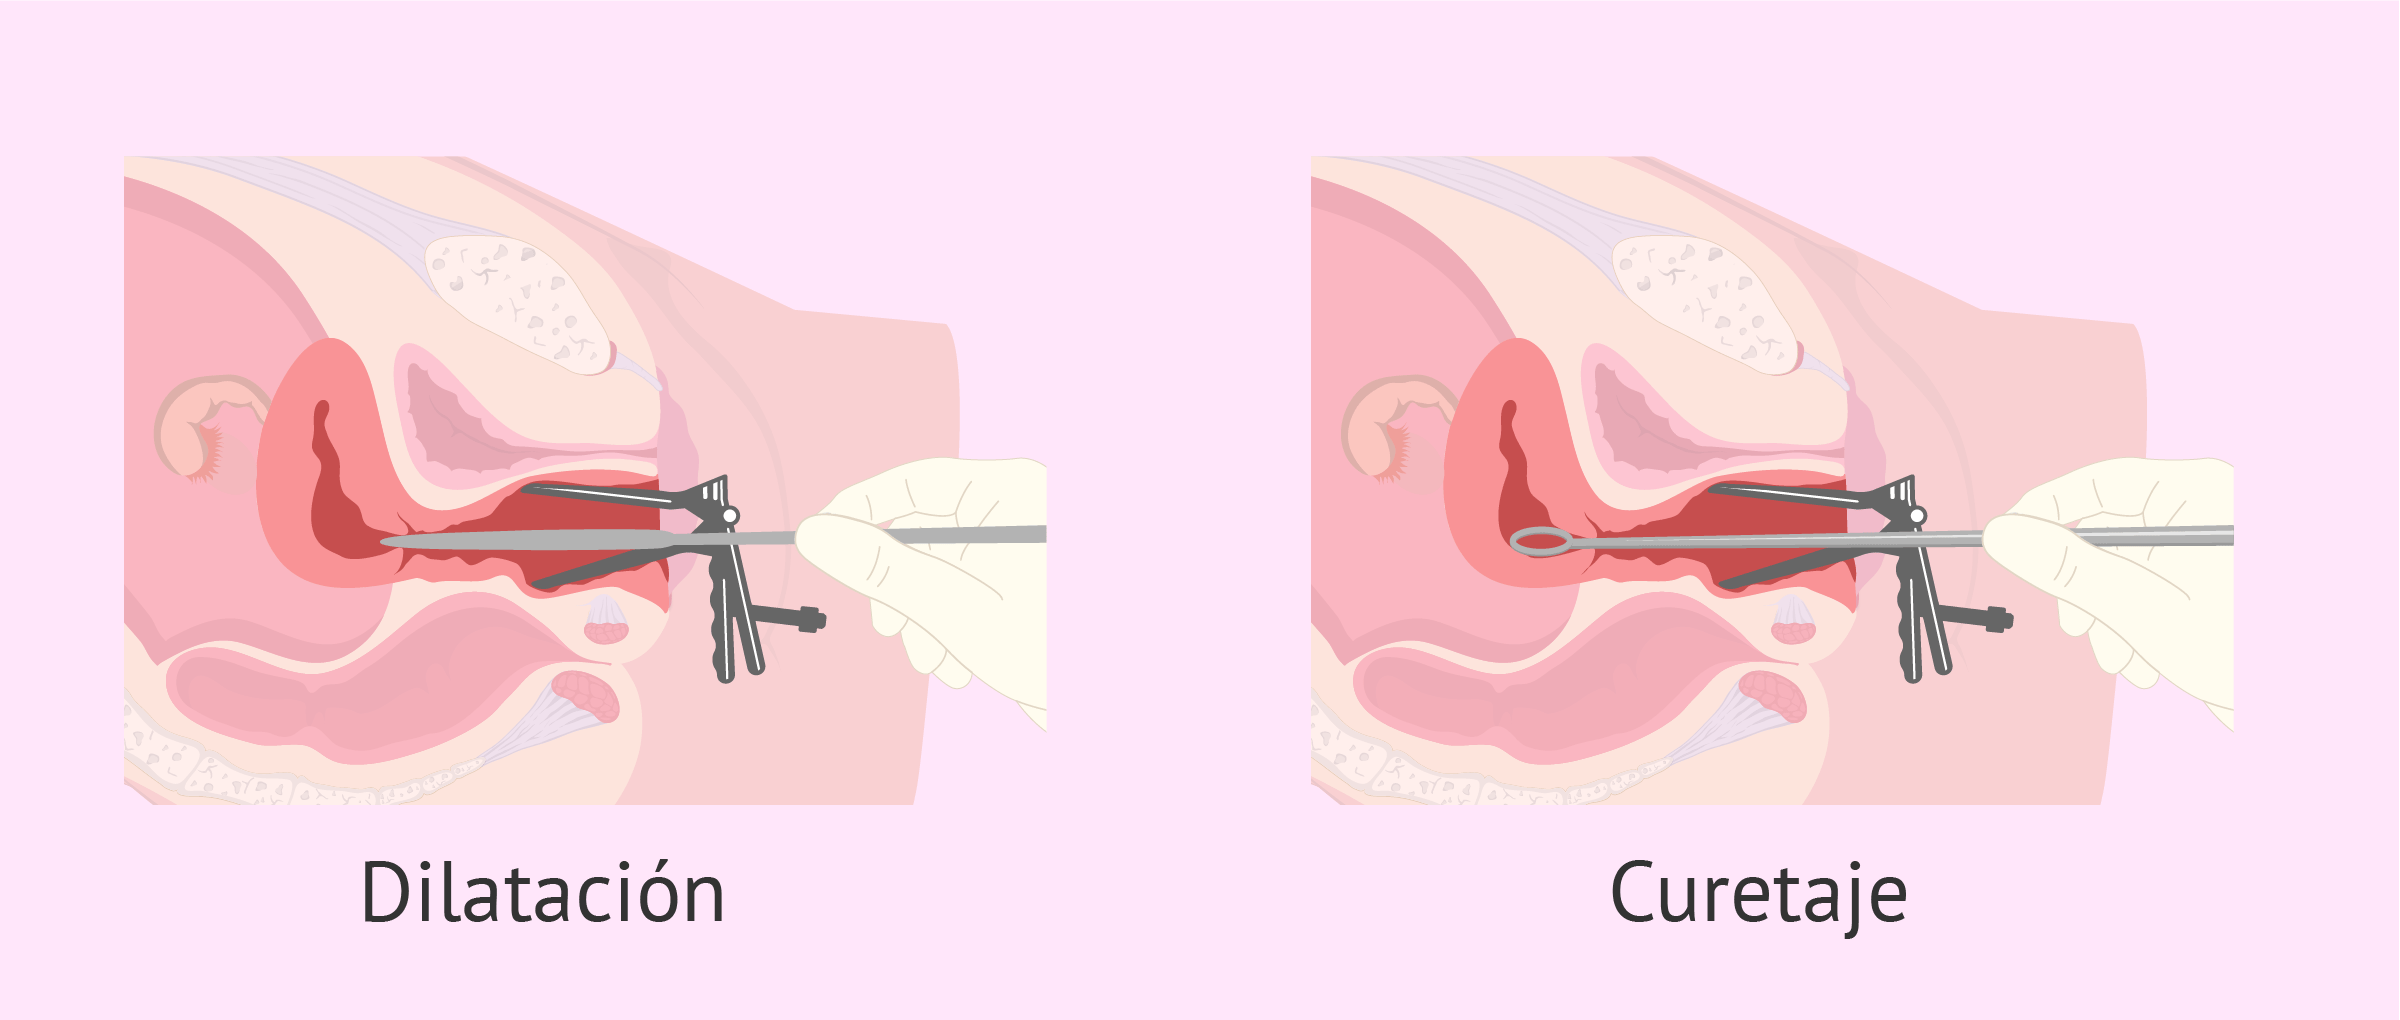 Como se realiza un legrado uterino